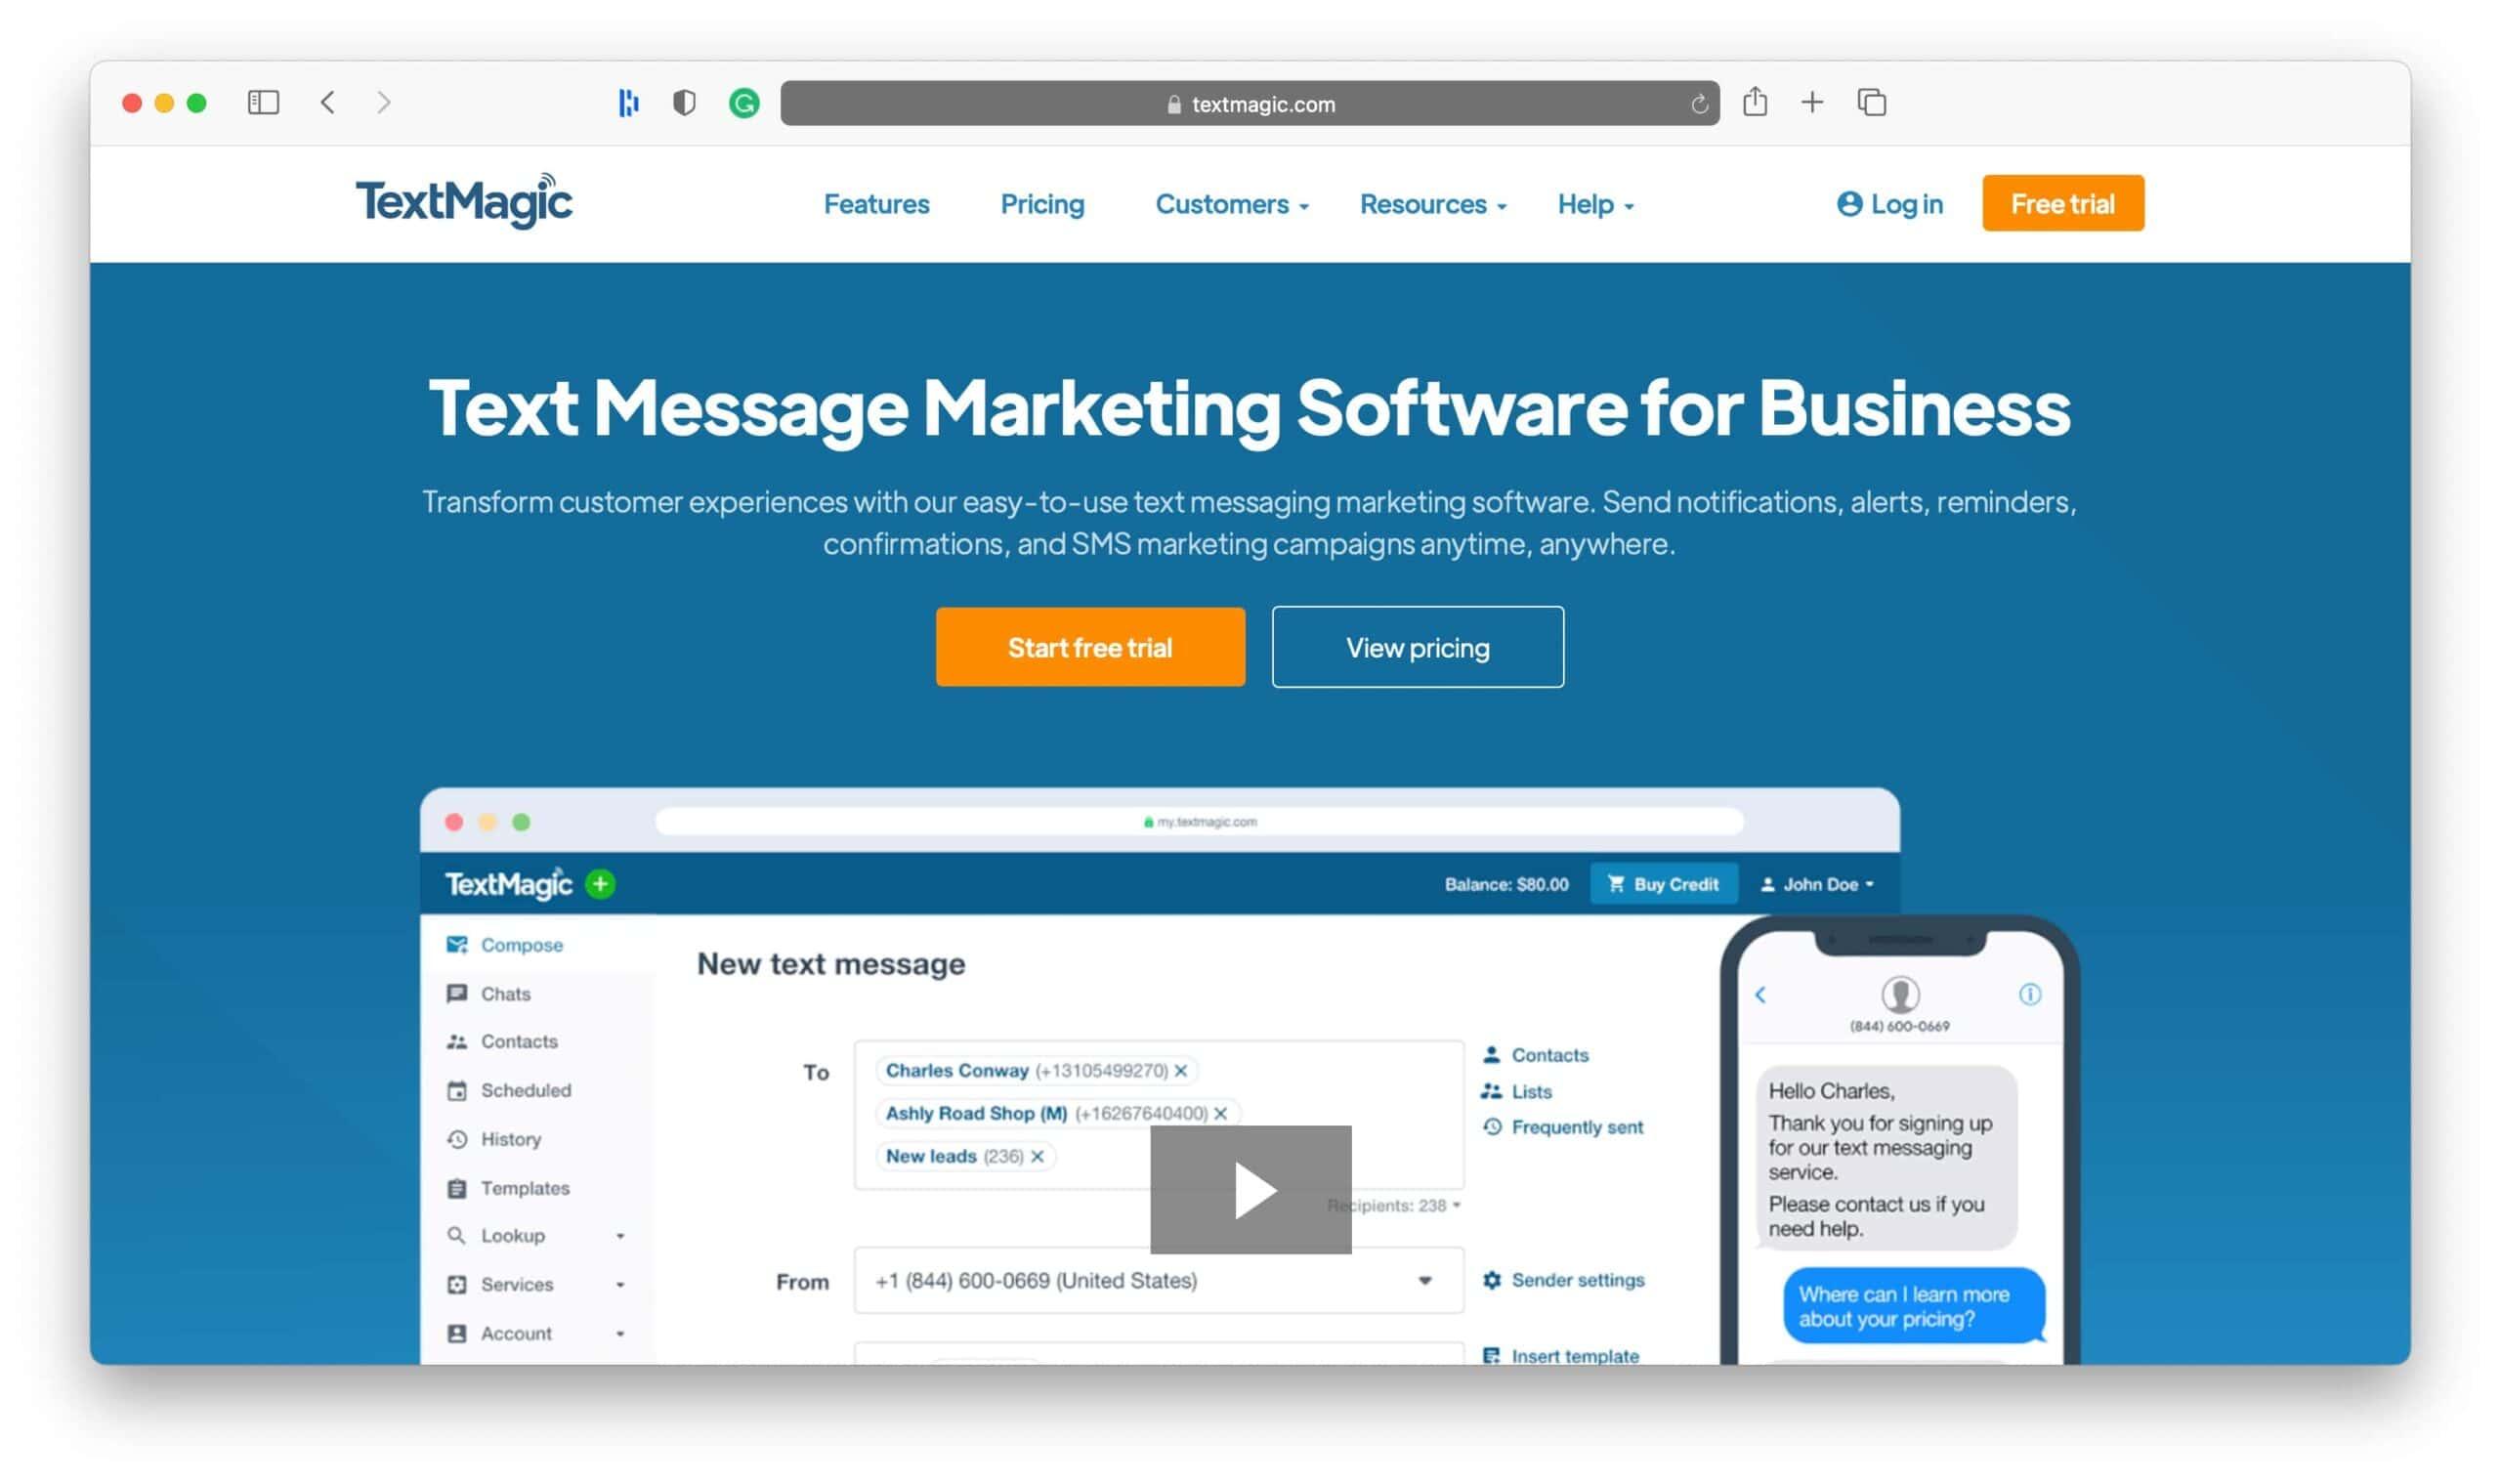 TextMagic SMS Marketing Tools